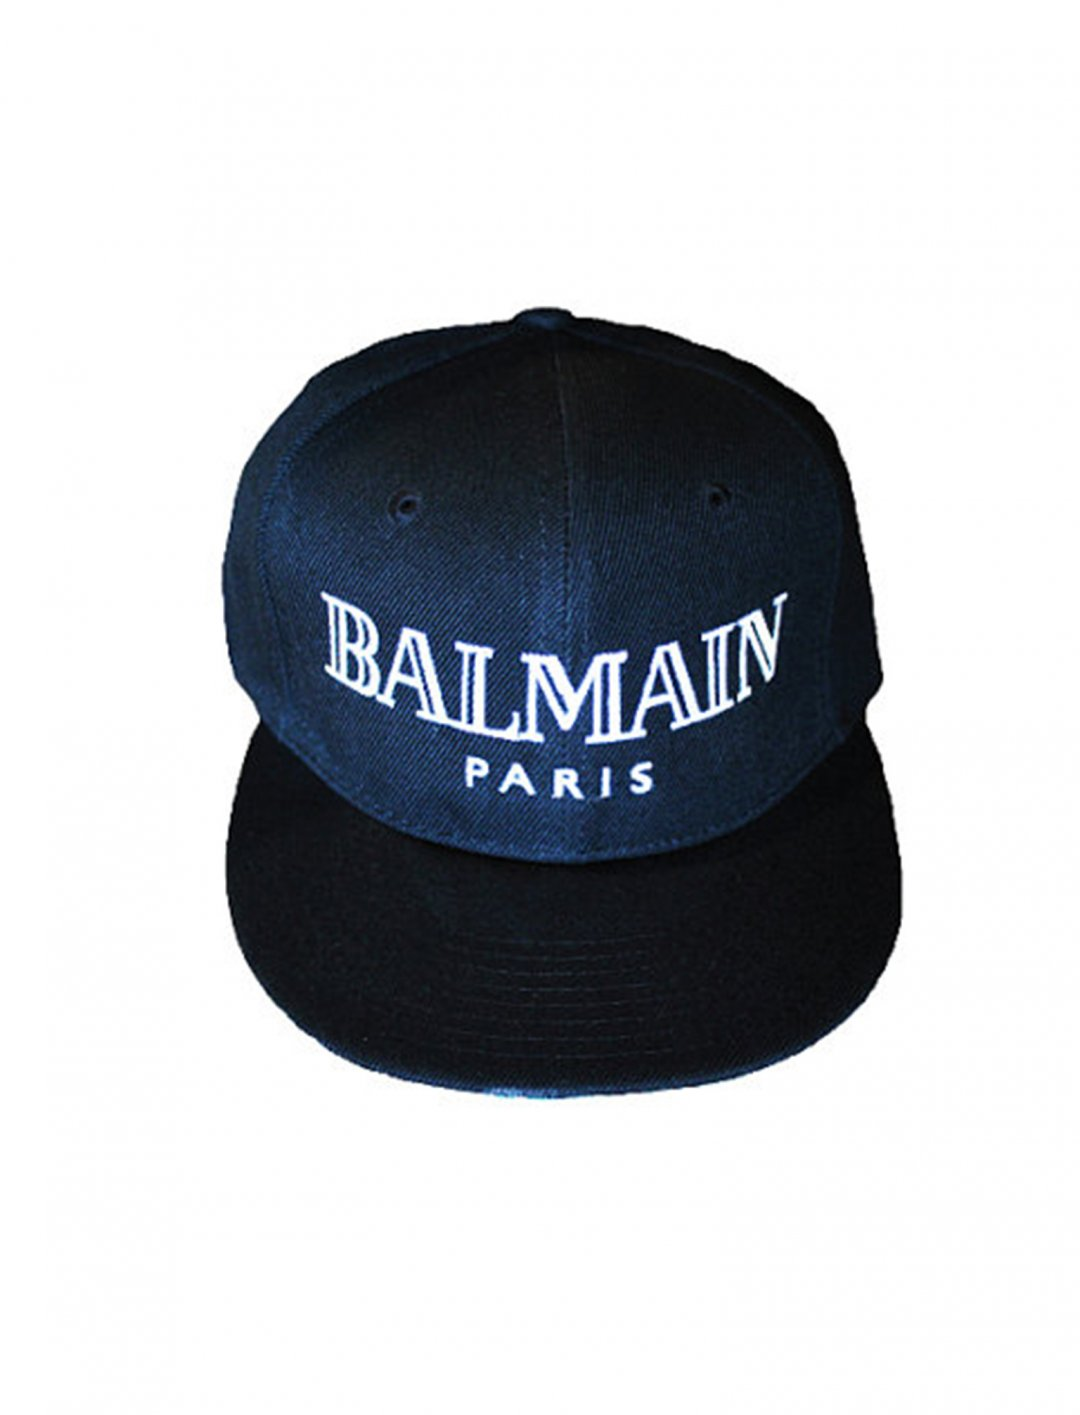 "'Balmain Paris' Logo Snapback Cap {""id"":16,""product_section_id"":1,""name"":""Accessories"",""order"":15} Lavish Snapbacks"